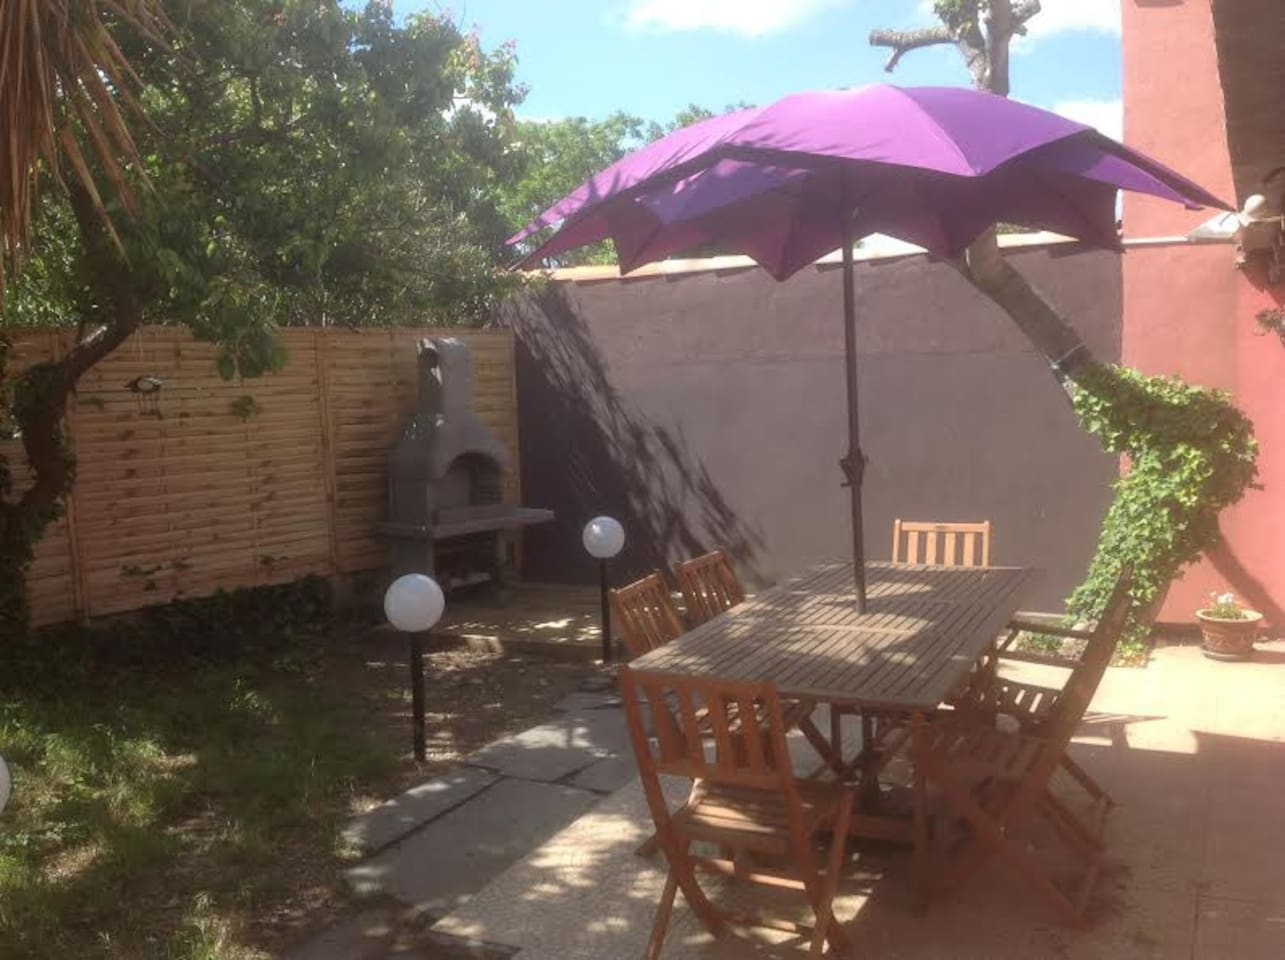 Terrasse en plein soleil - Barbecue en dur